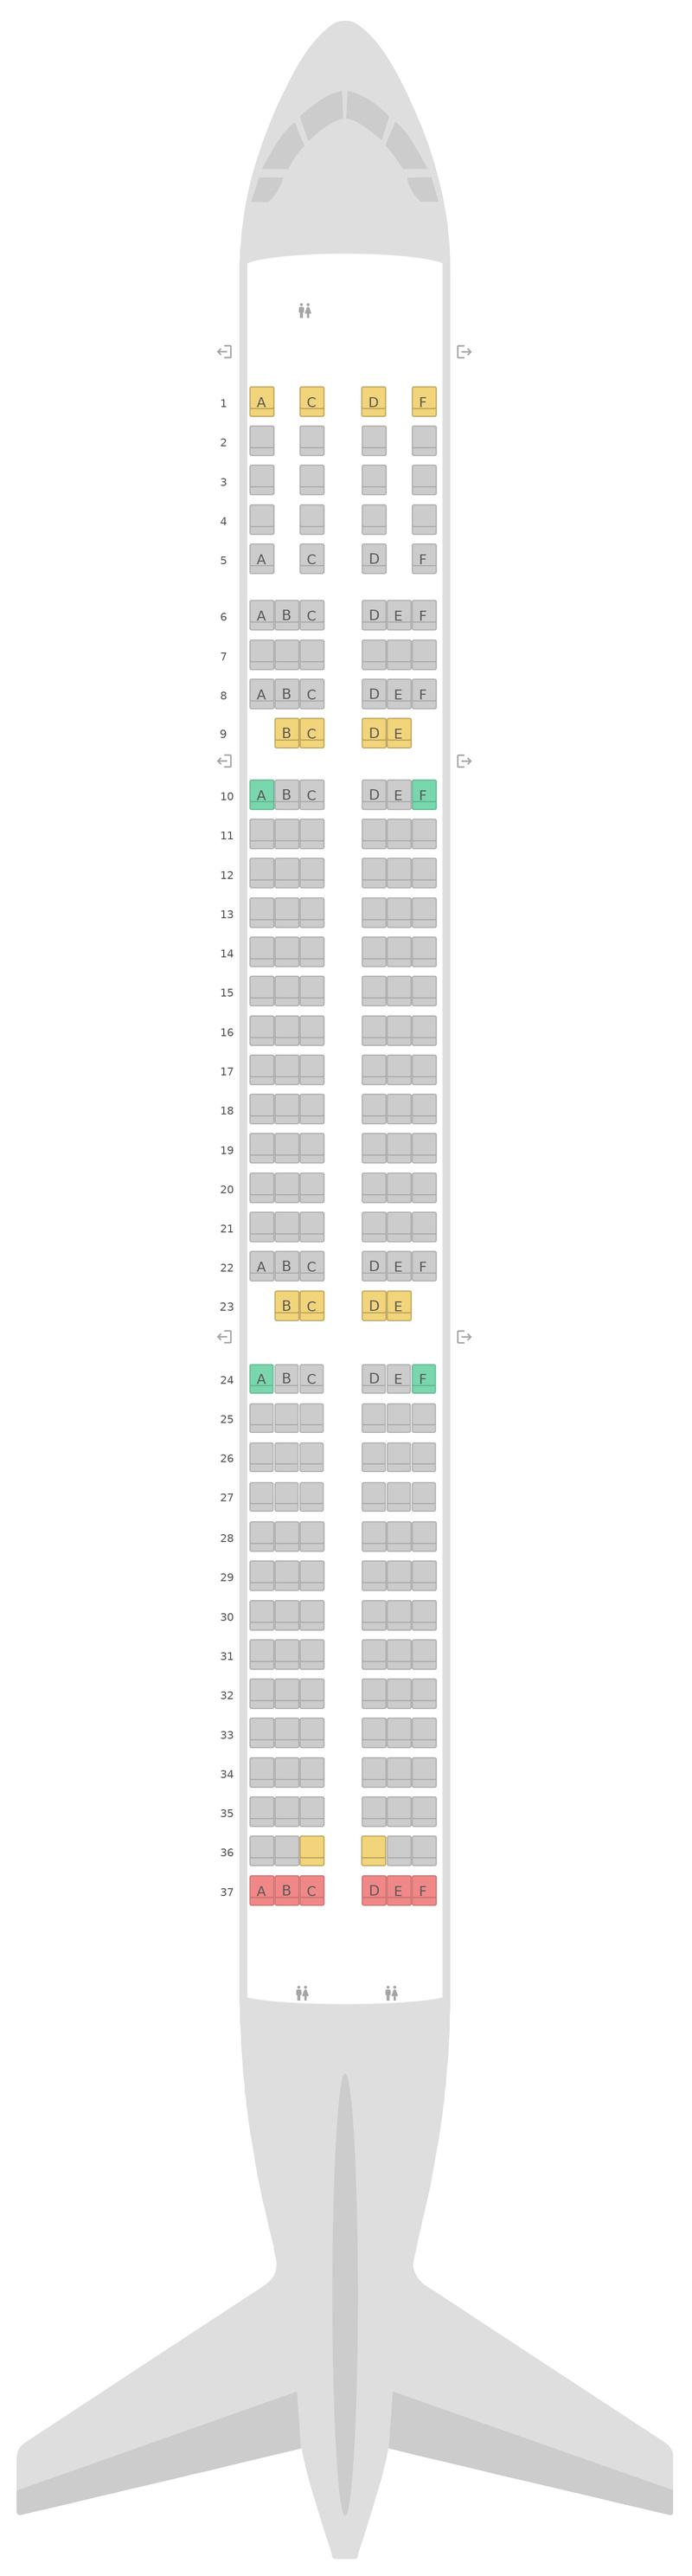 Seat Map Airbus A321neo v2 British Airways